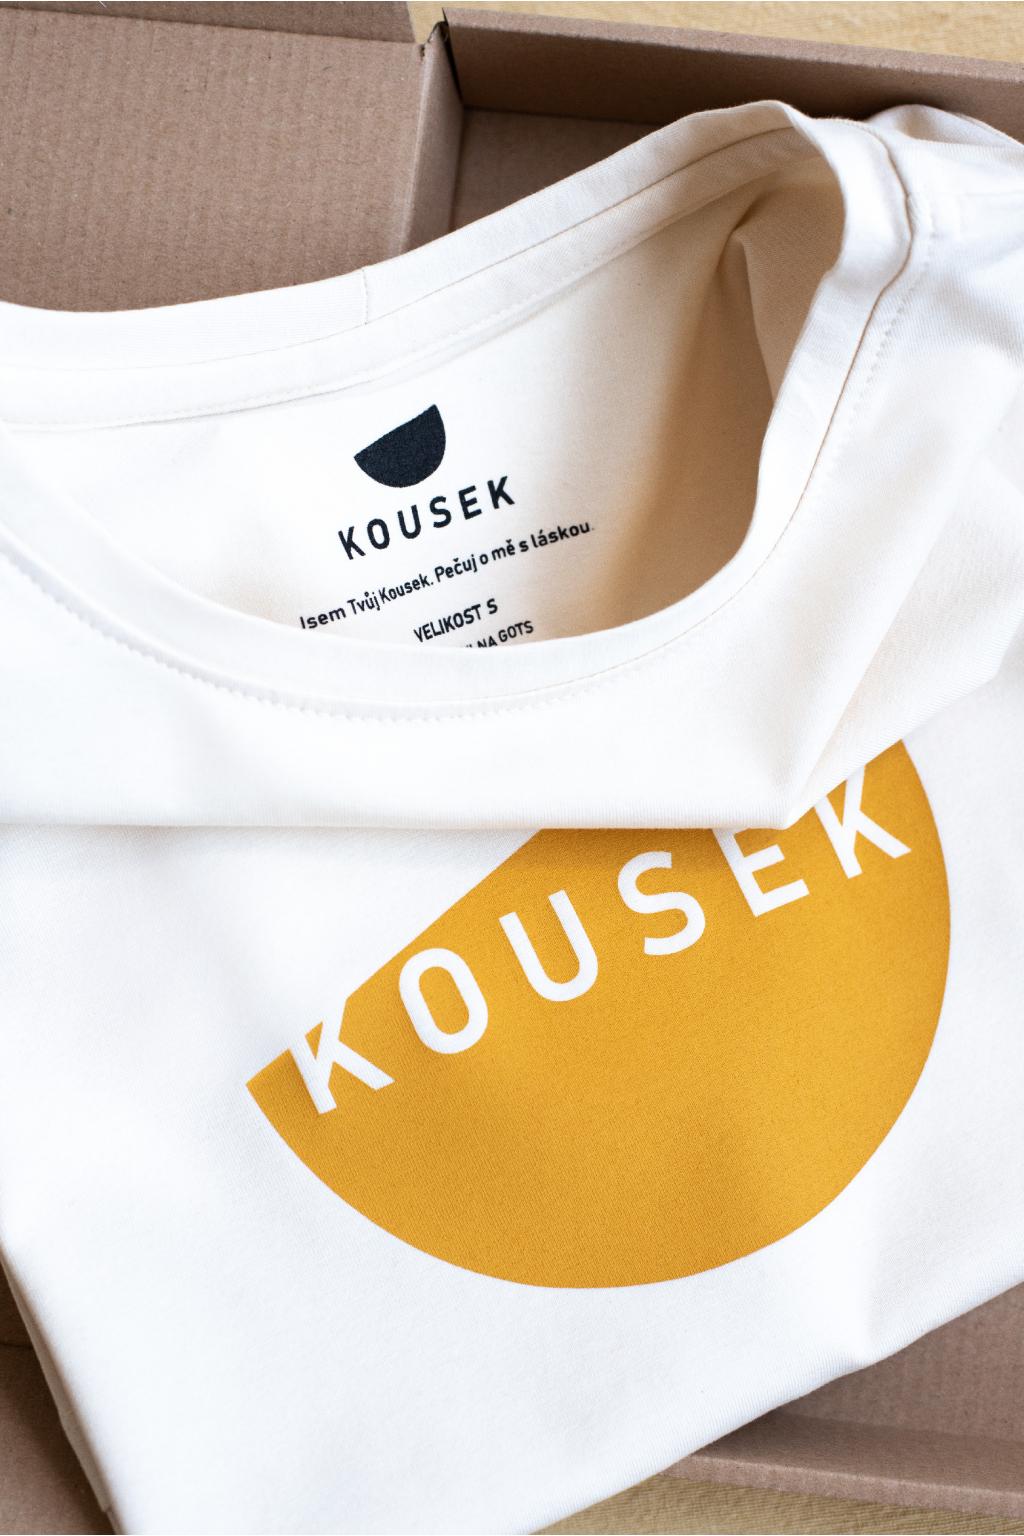 KOUSEK krátké tričko biobavlna logo Kousek